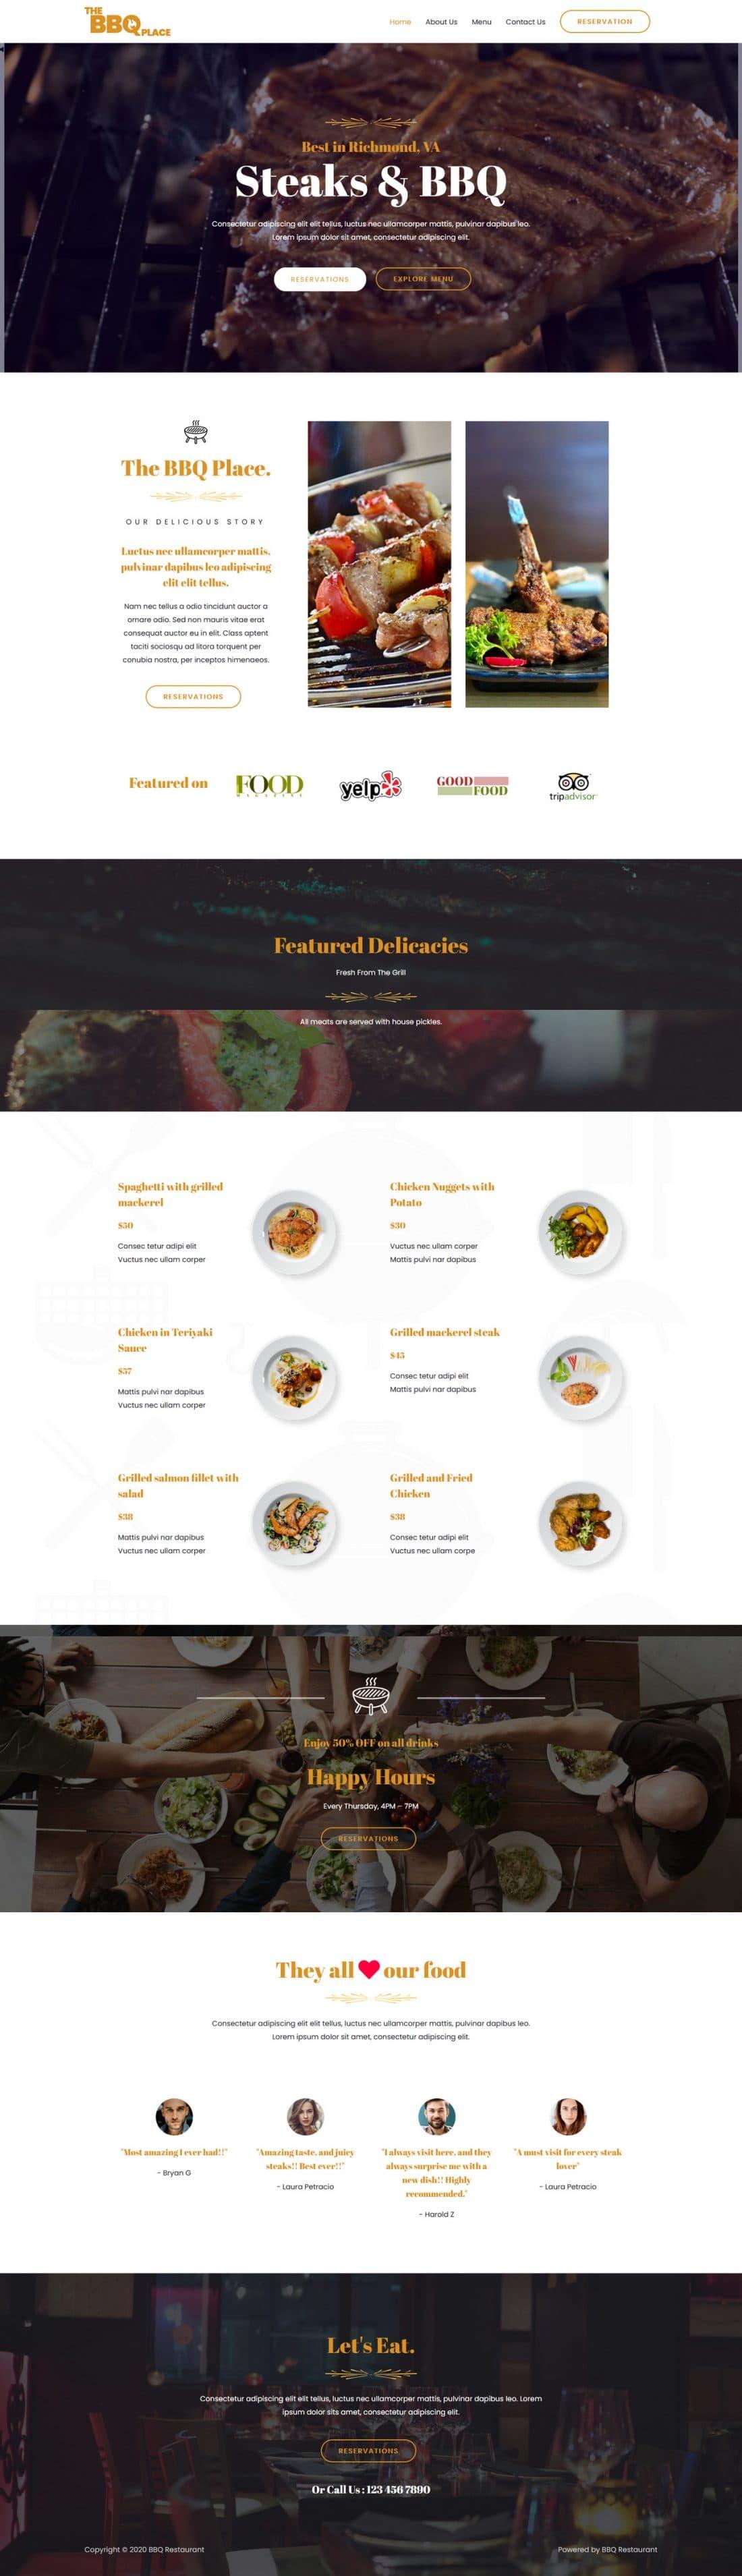 Fagowi.com Website Design Templates For Restaurant Steak BBQ - Home Page Image